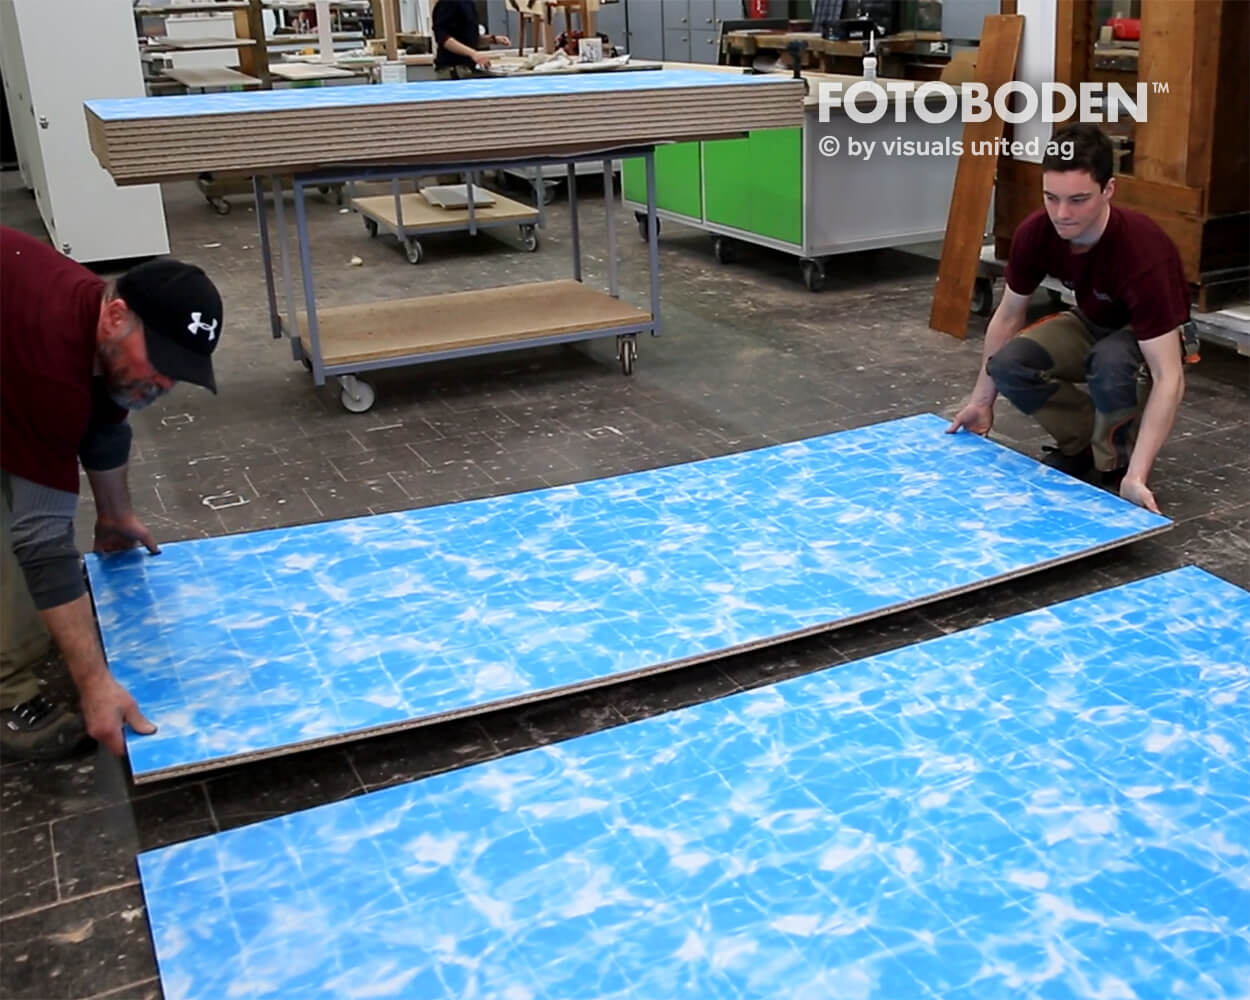 Boot2018 Fotoboden Messeboden Tradeshow Flooring Bodengestaltung Messe Bodendesign Messedesign Design Boden Messegestaltung 5